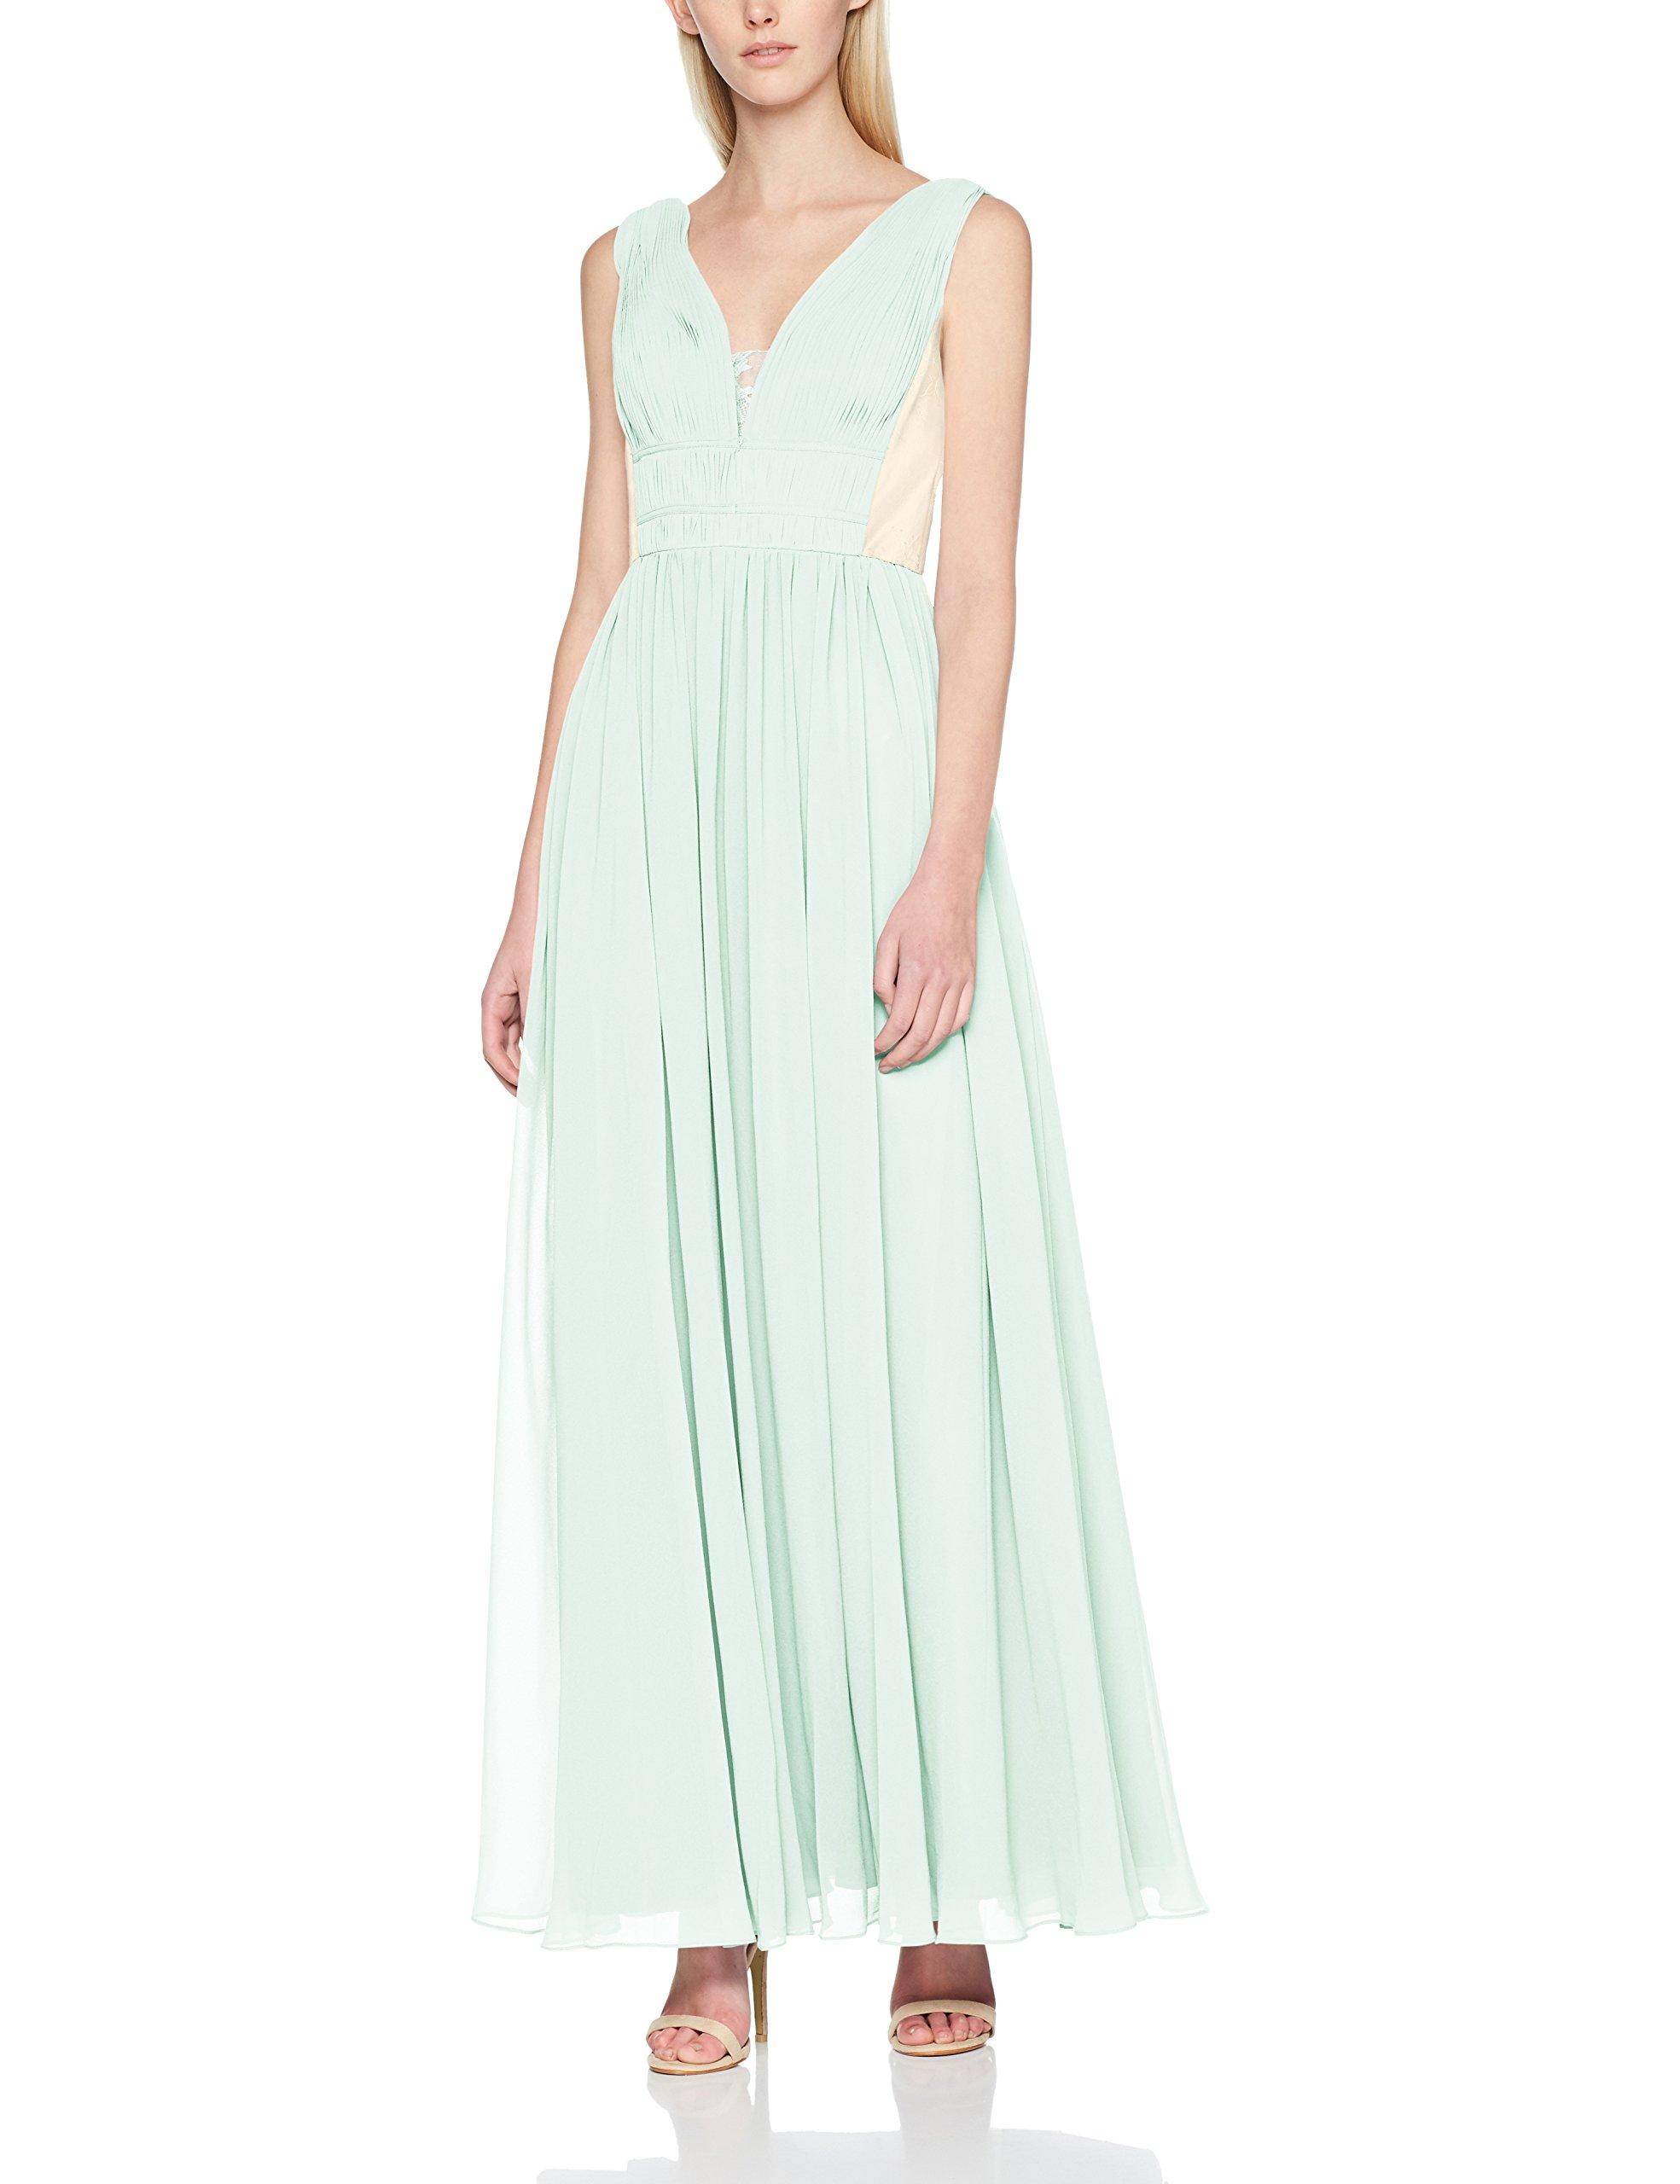 907538 Femme Dress Laona RobeMehrfarbigjade Mint nude Evening QrdxBCoWEe